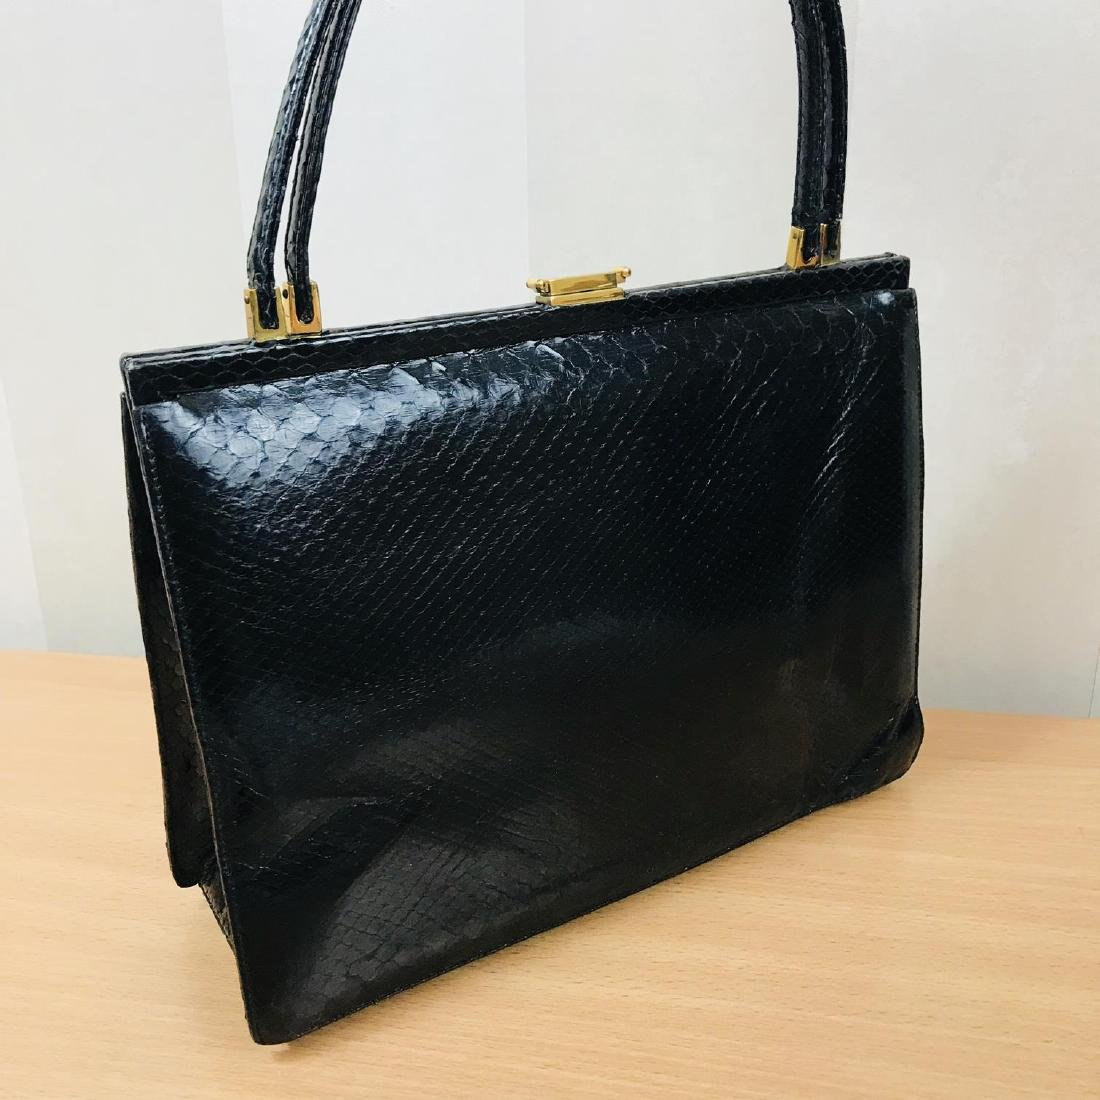 Vintage Black Snakeskin Leather Handbag - 5